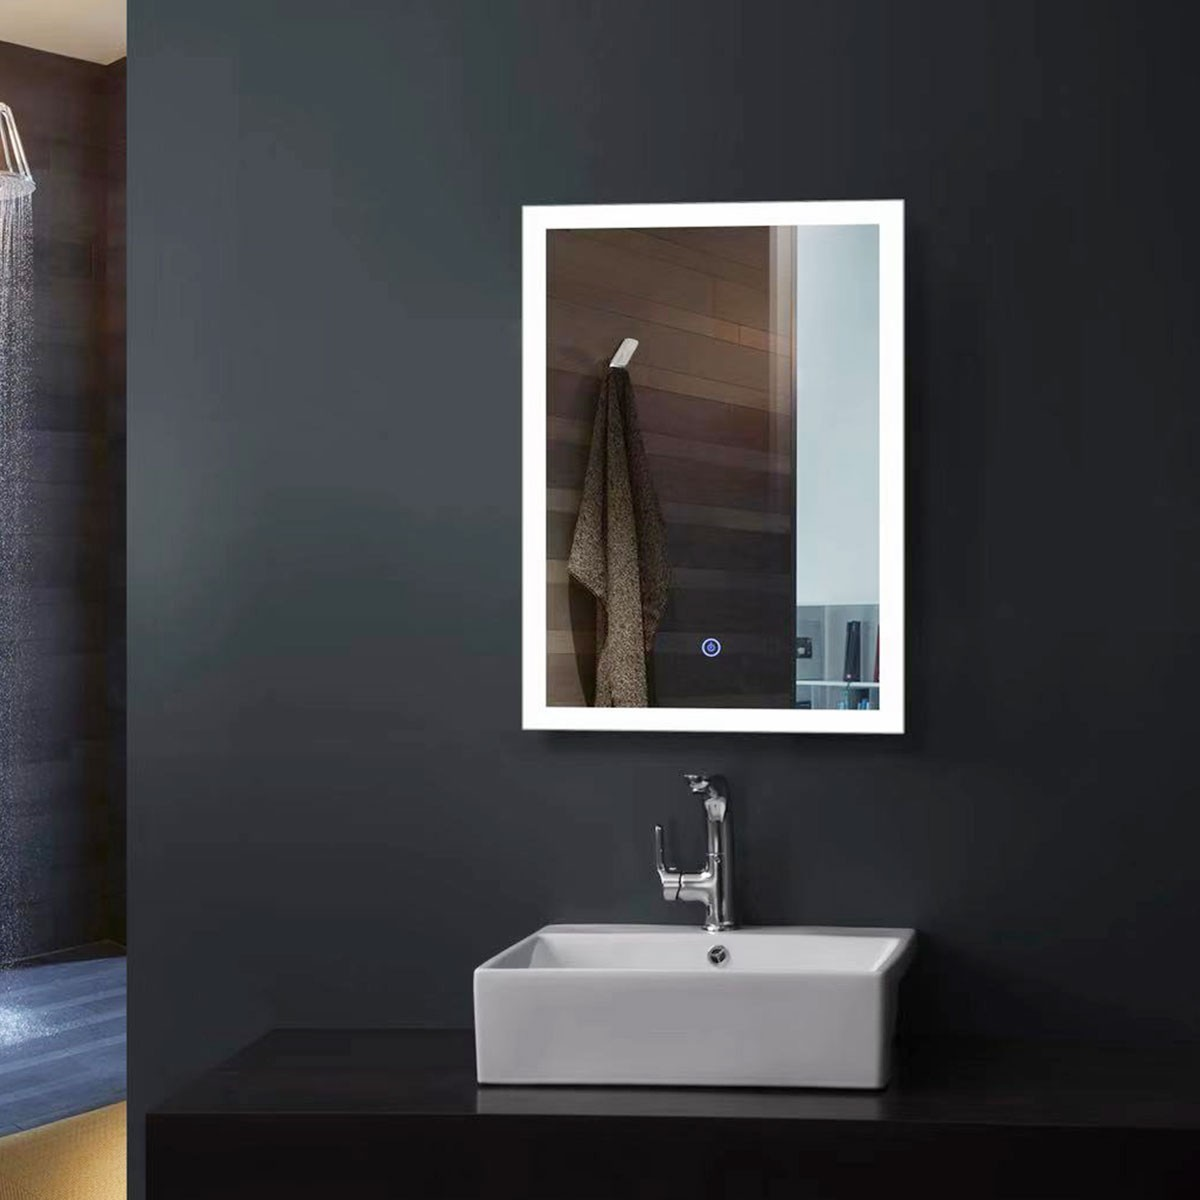 20 x 28 In Vertical LED Bathroom Mirror, Touch Button (DK-OD-N031-H)